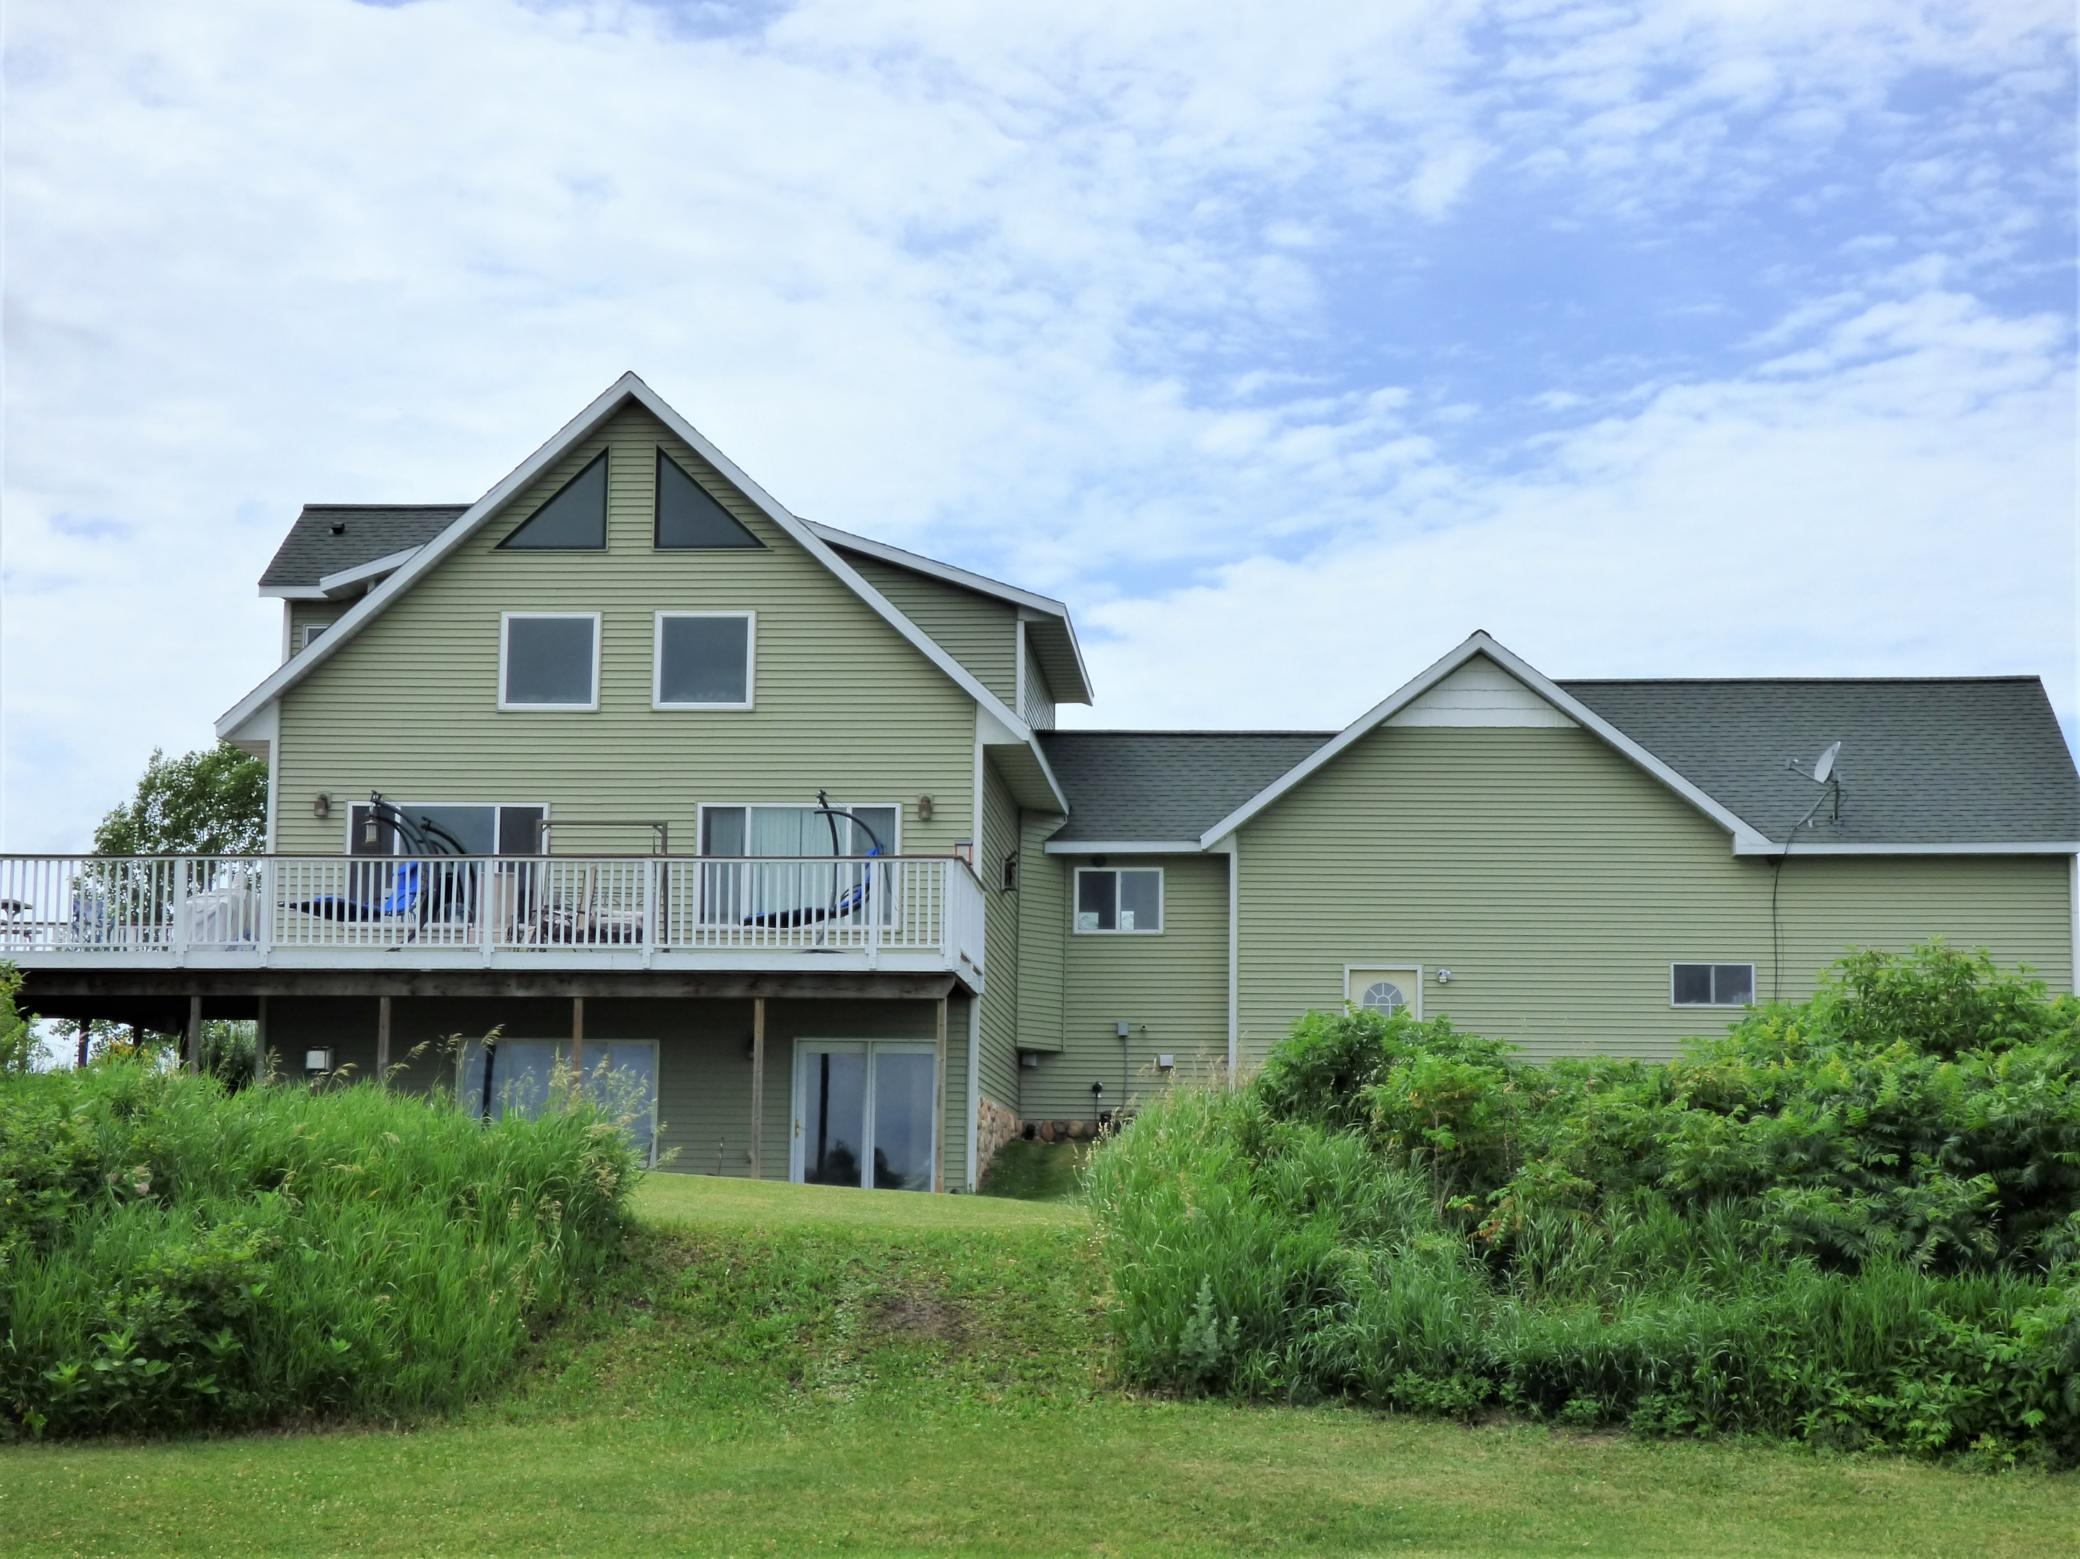 43750 E Big Mcdonald Drive Property Photo - Dent, MN real estate listing